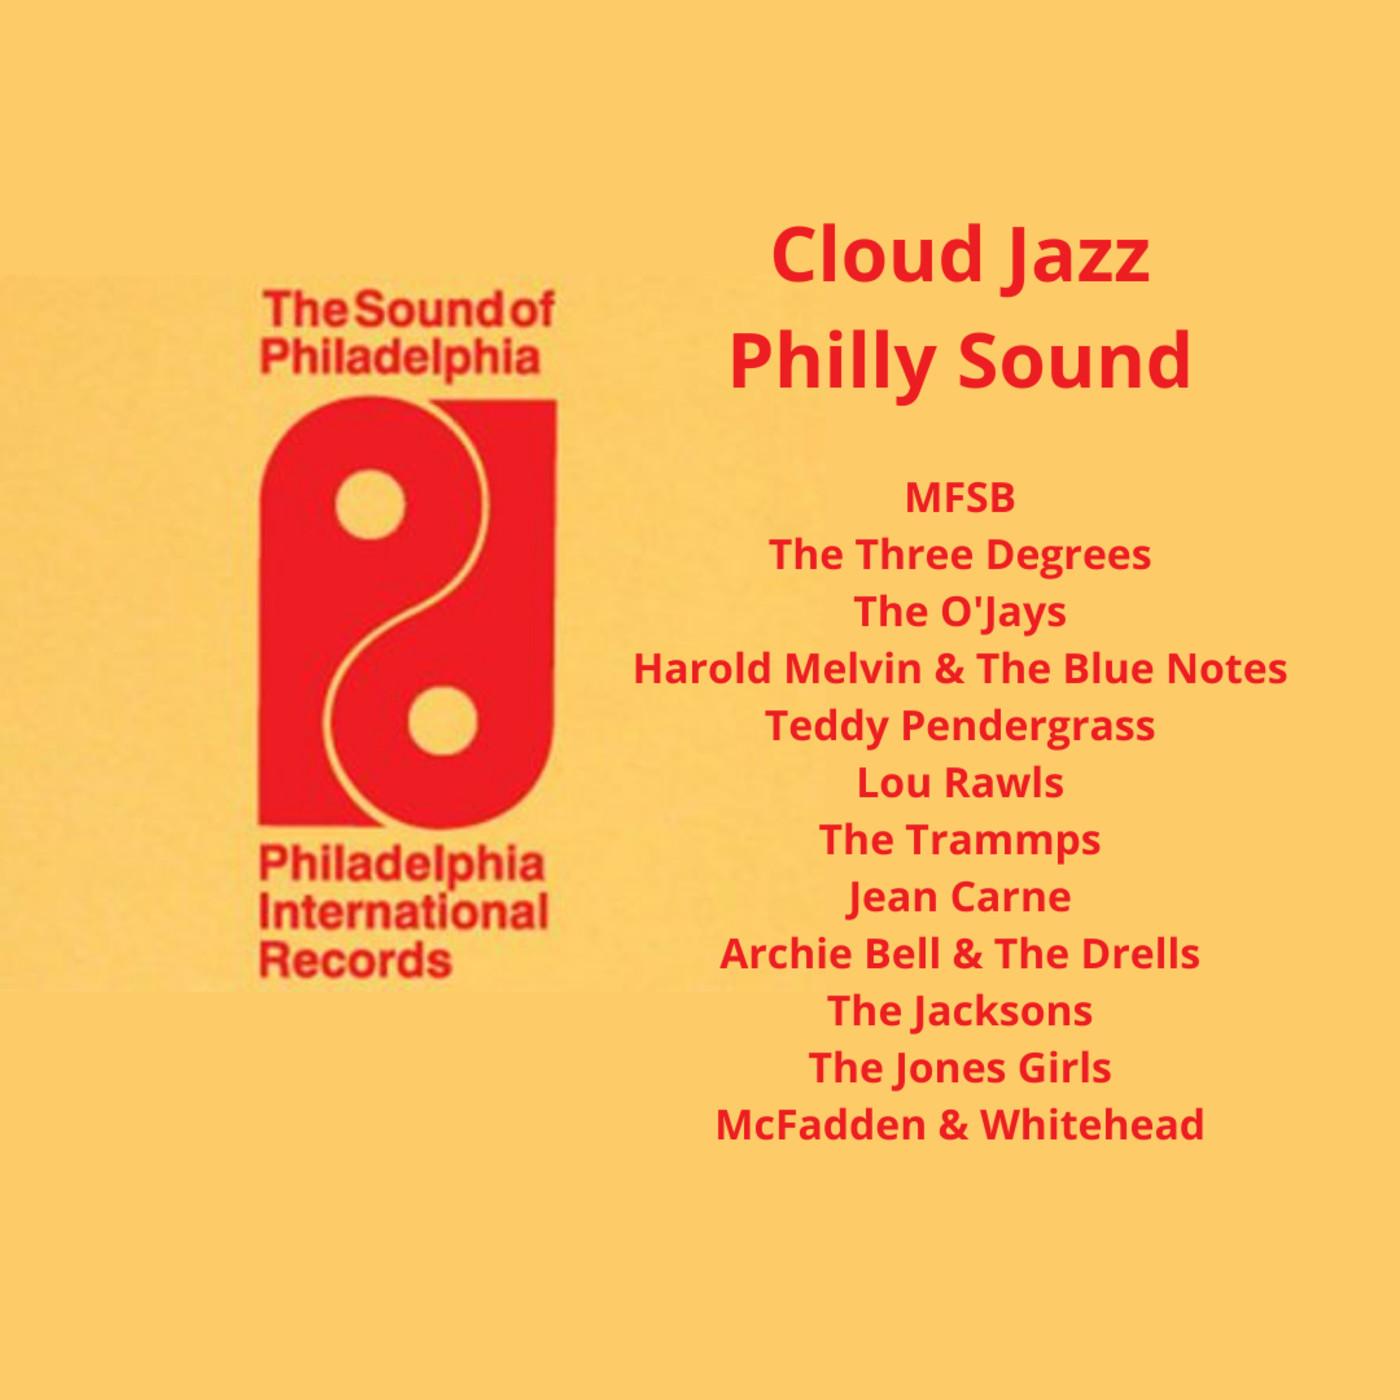 Cloud Jazz Nº 1885 (Especial Phillysound)